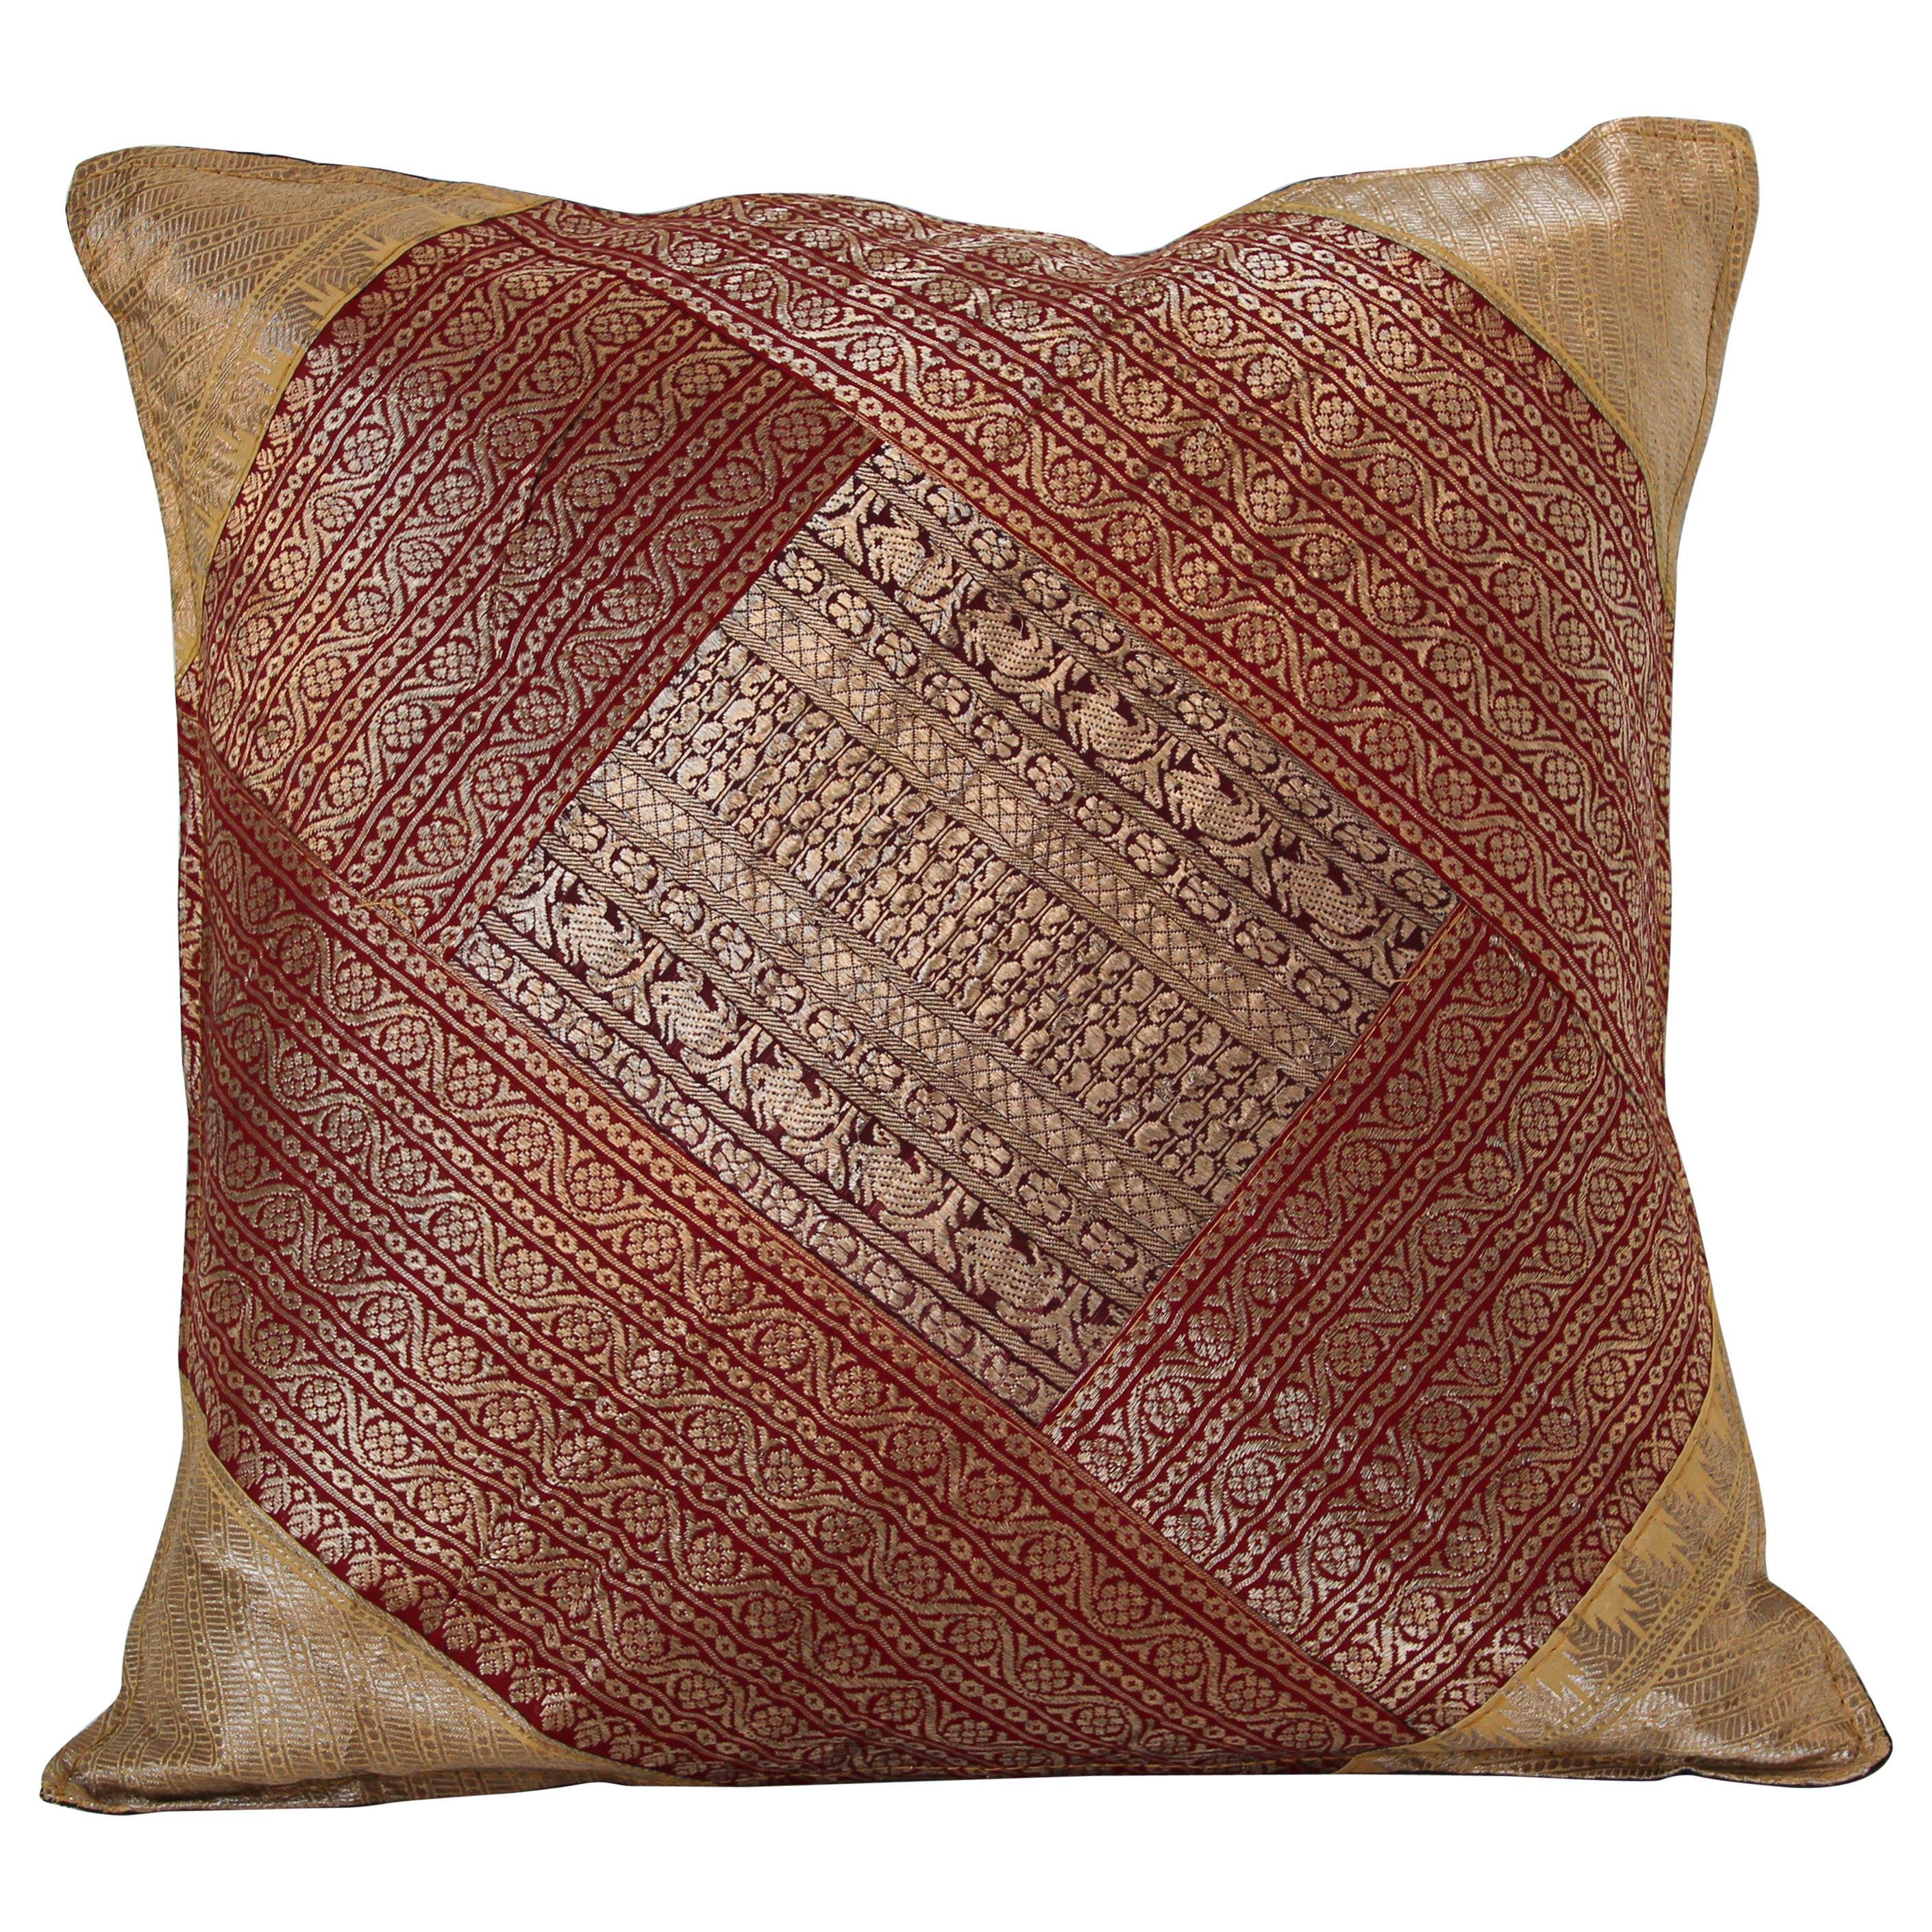 Decorative Silk Throw Pillow Made from Vintage Sari Borders, India